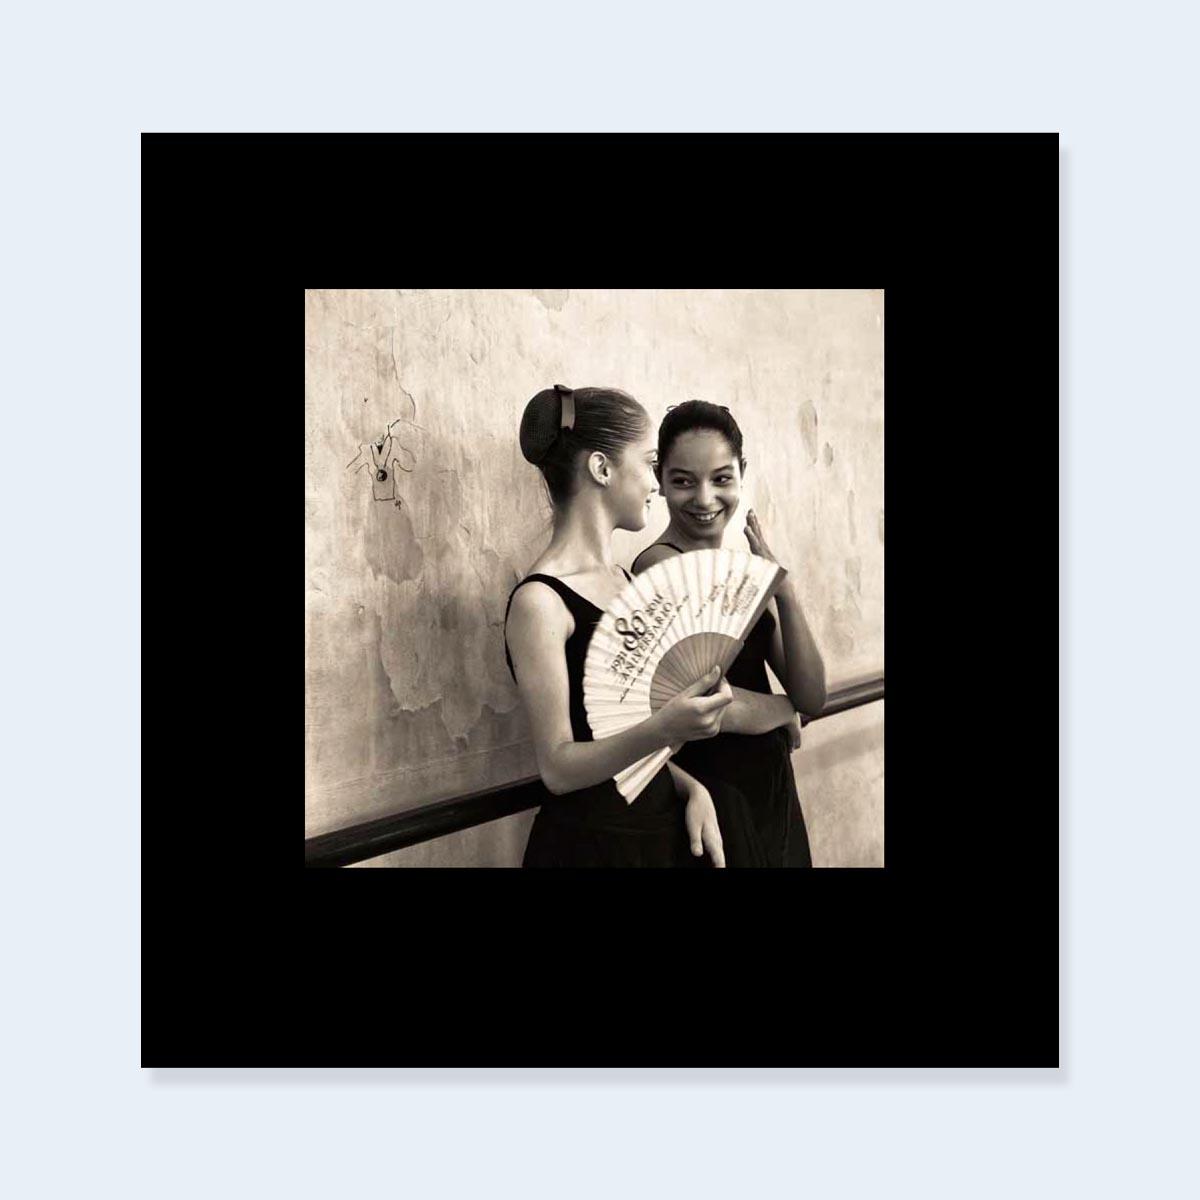 REBEKAH BOWMAN |  Portrait of the Cuban School of Ballet (Special Edition) | Order >